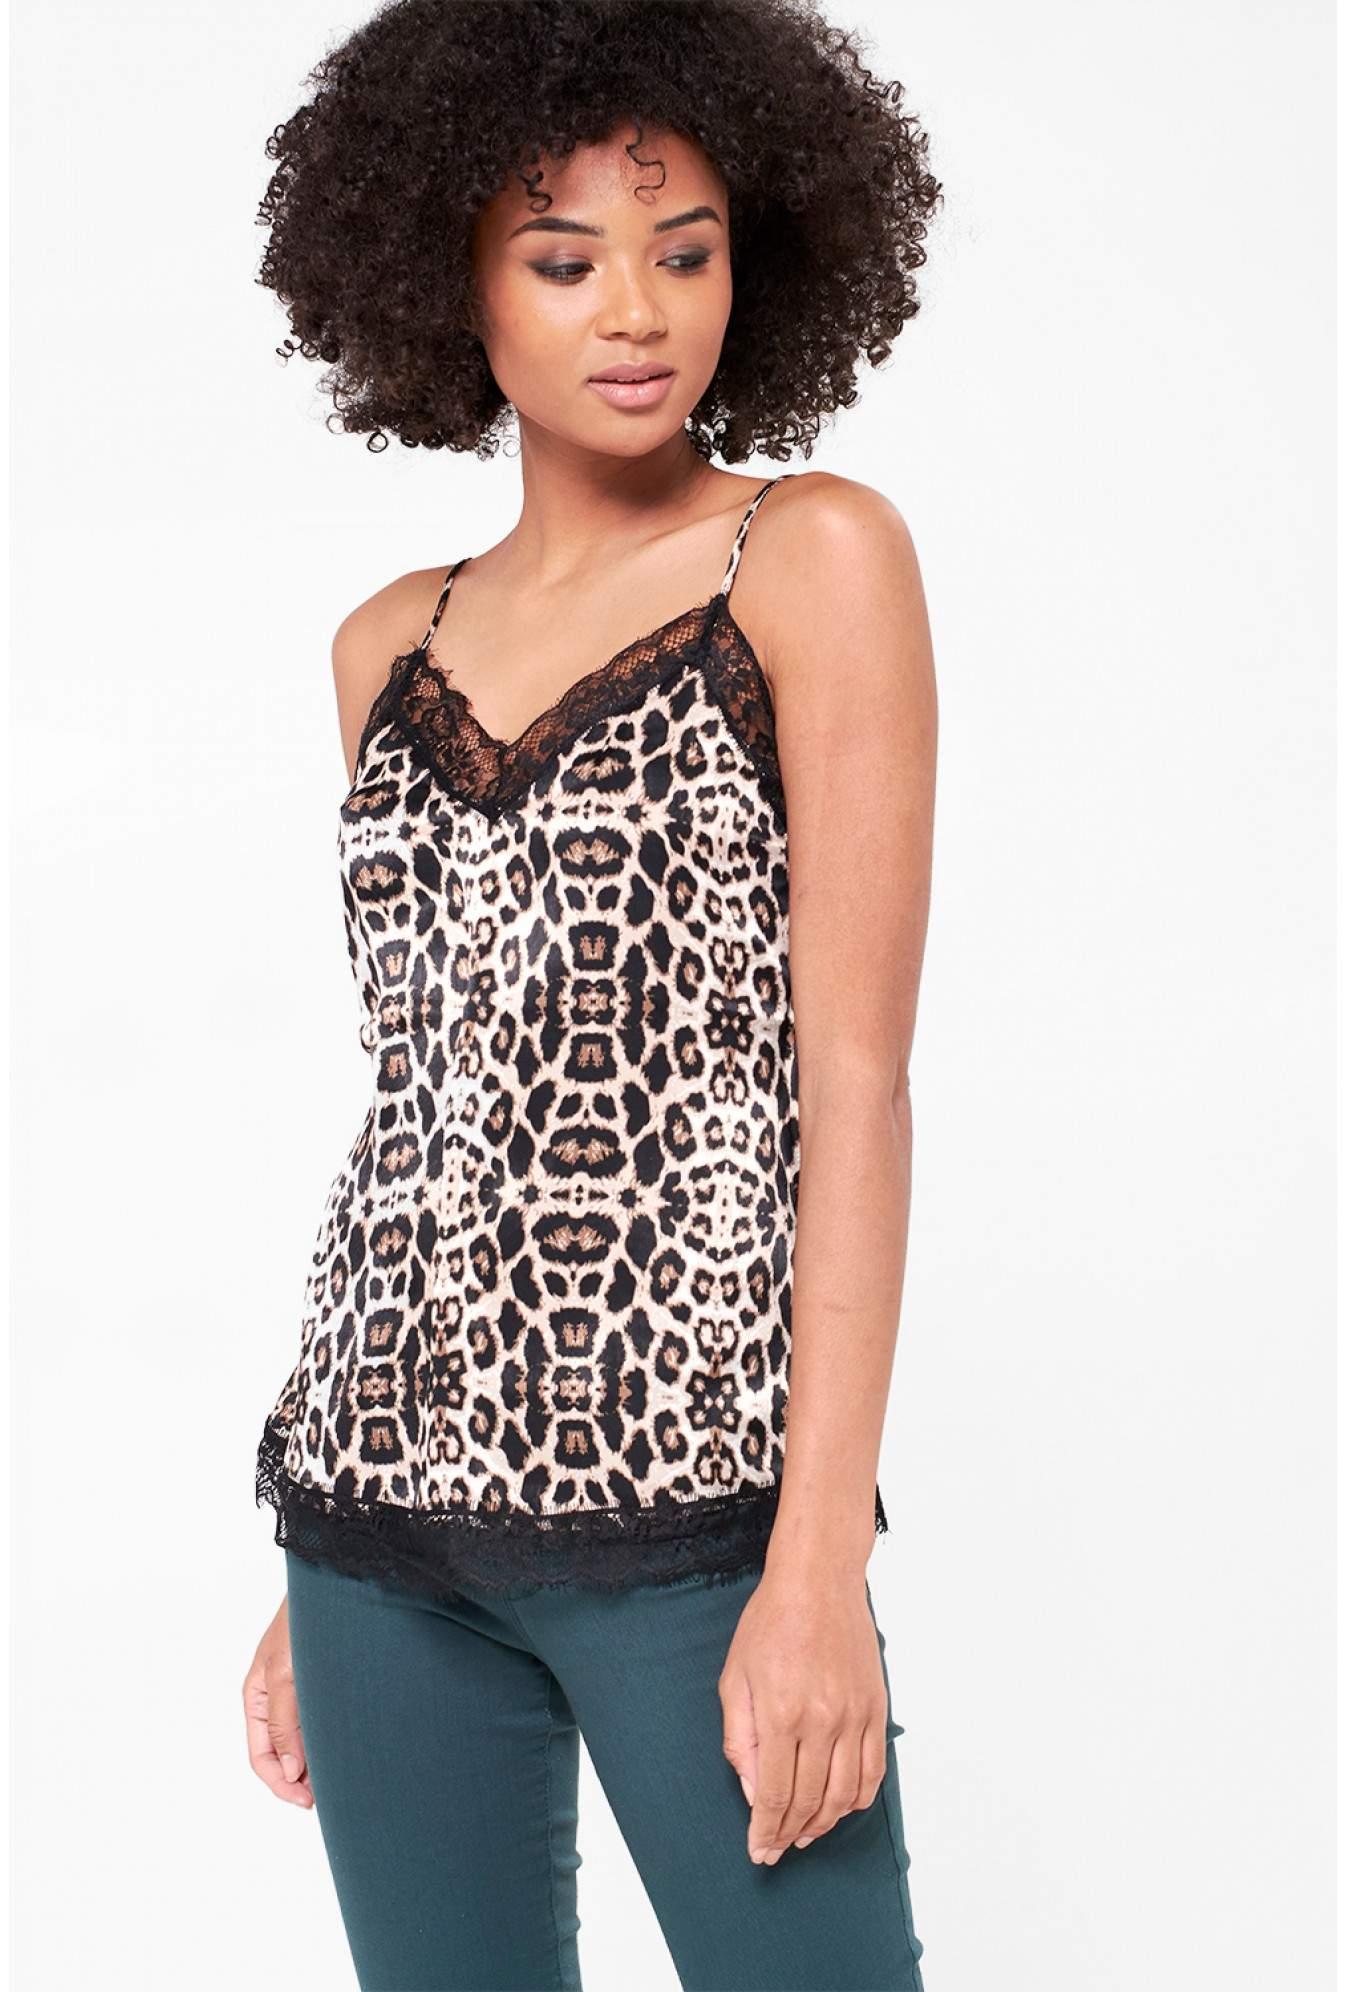 7e3e31421 Jacqueline De Yong Fun Cami with Lace Detail in Leopard Print ...